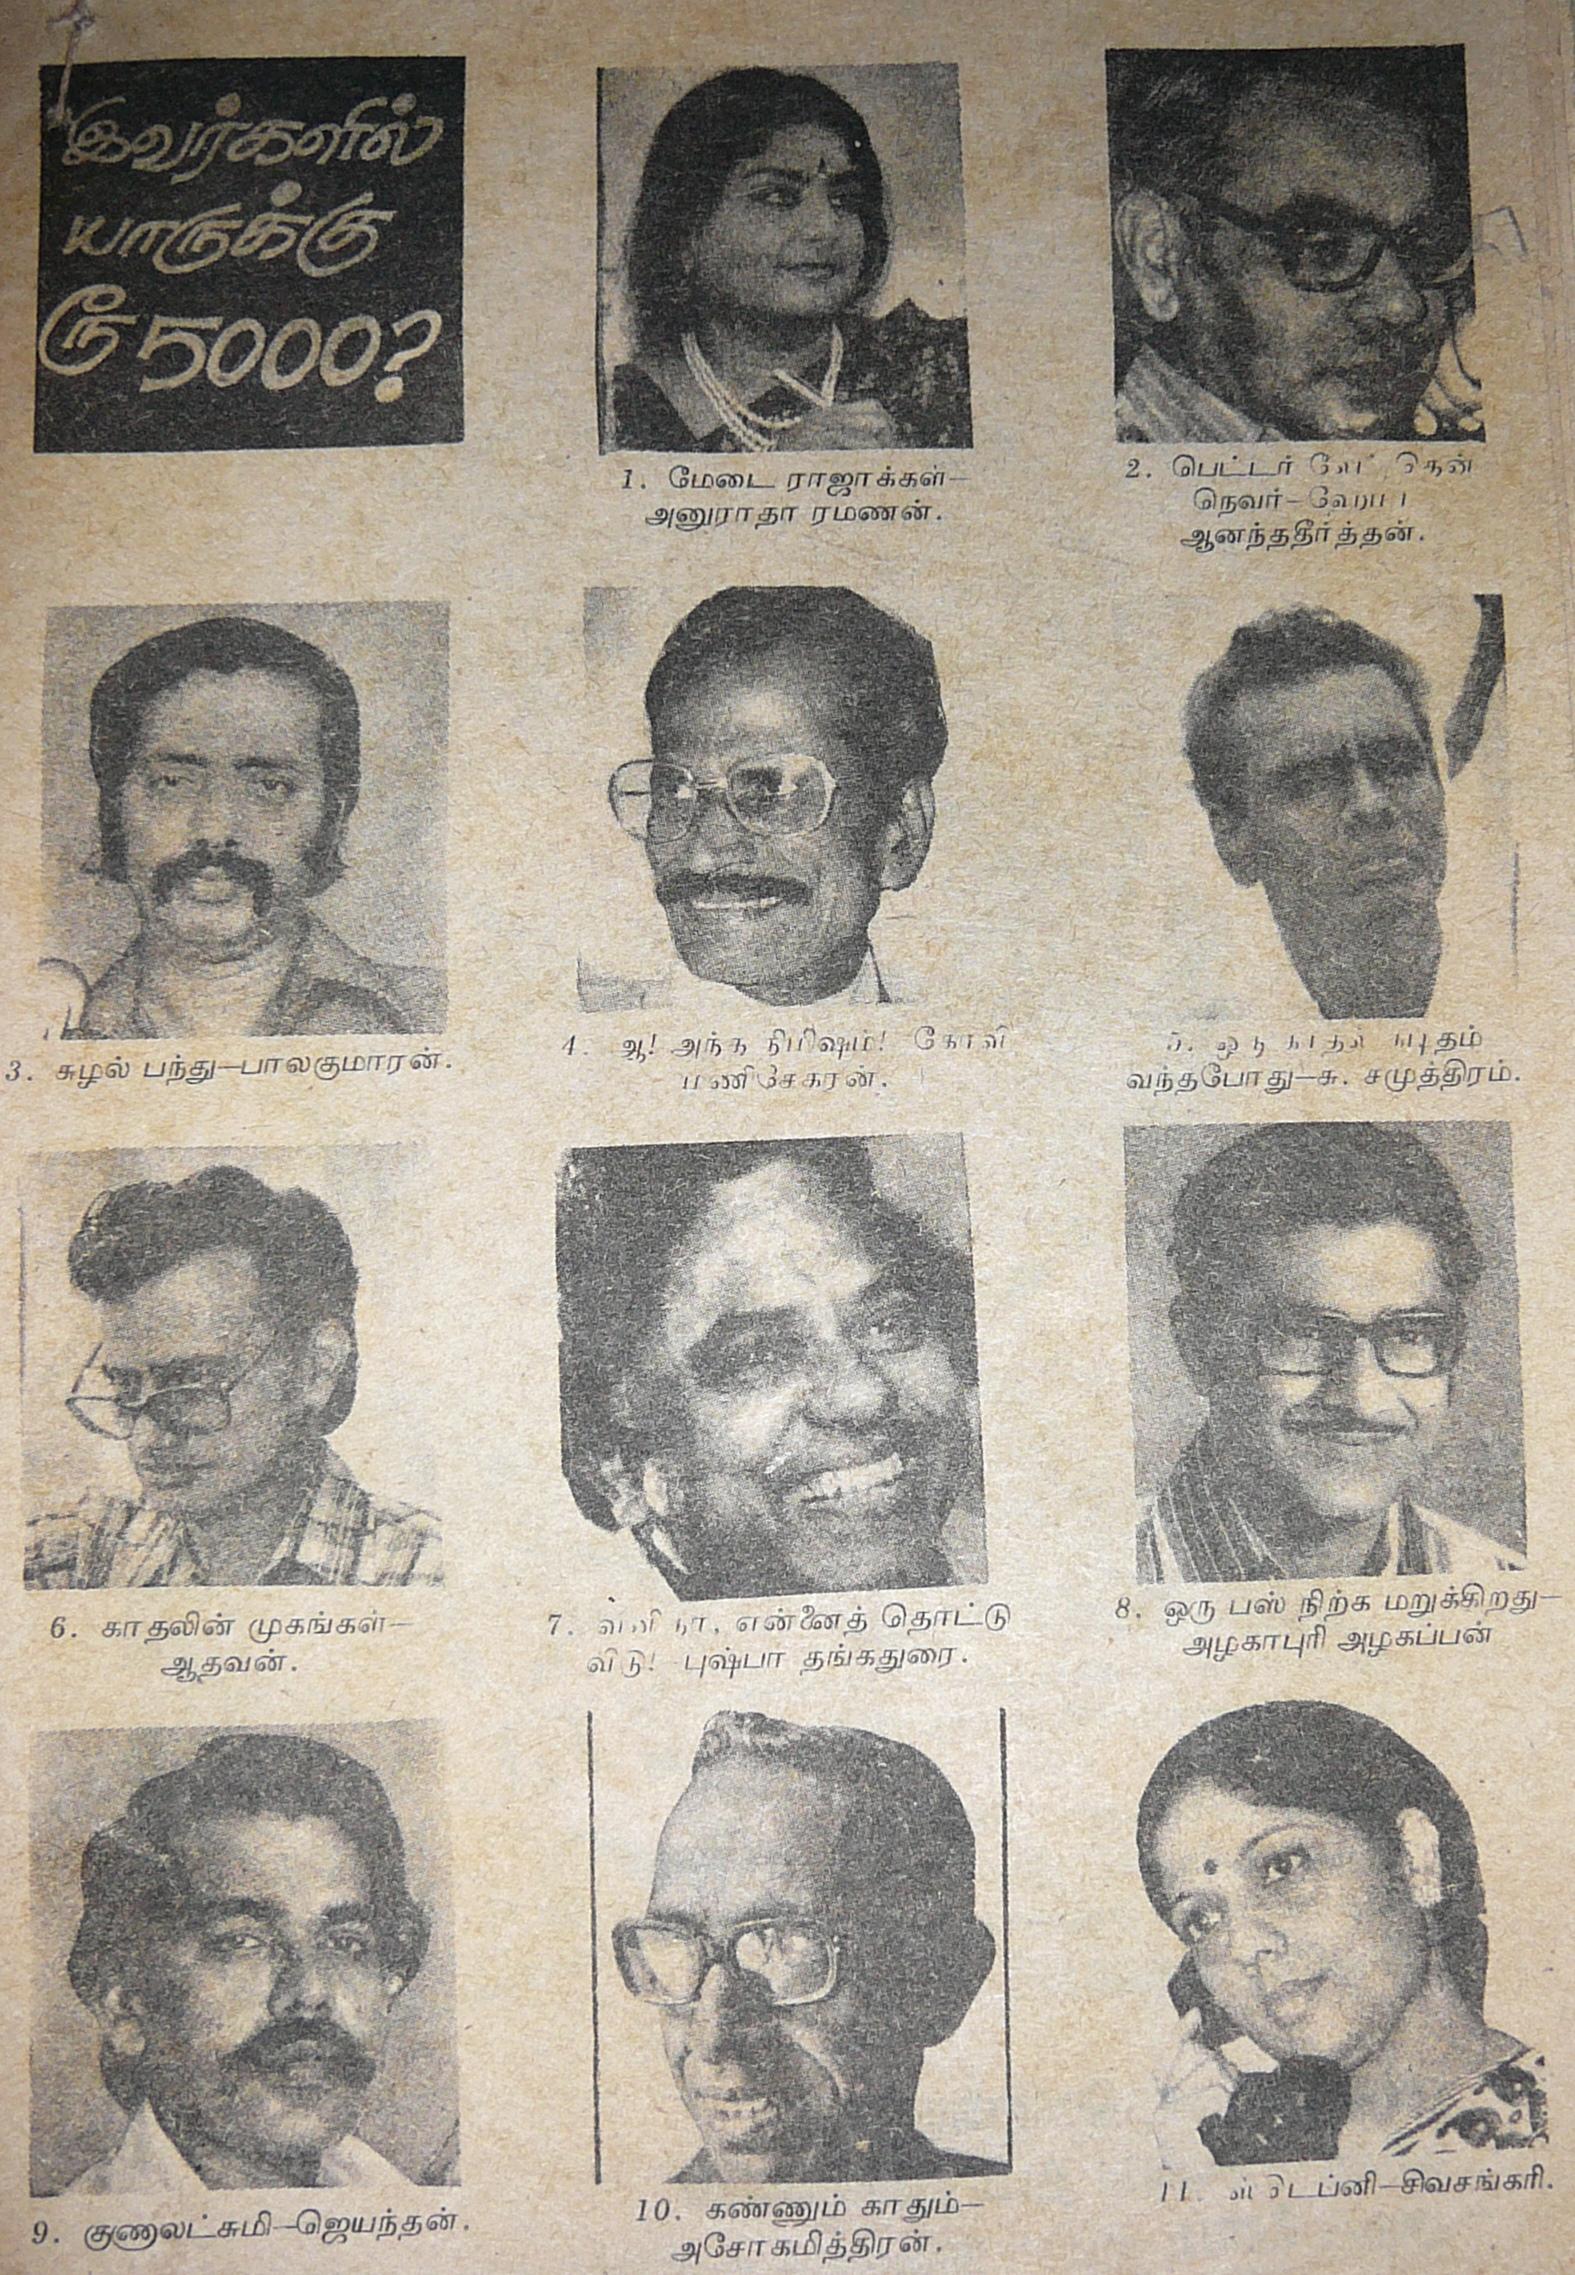 1982 - Short Story Contest in Kumudham